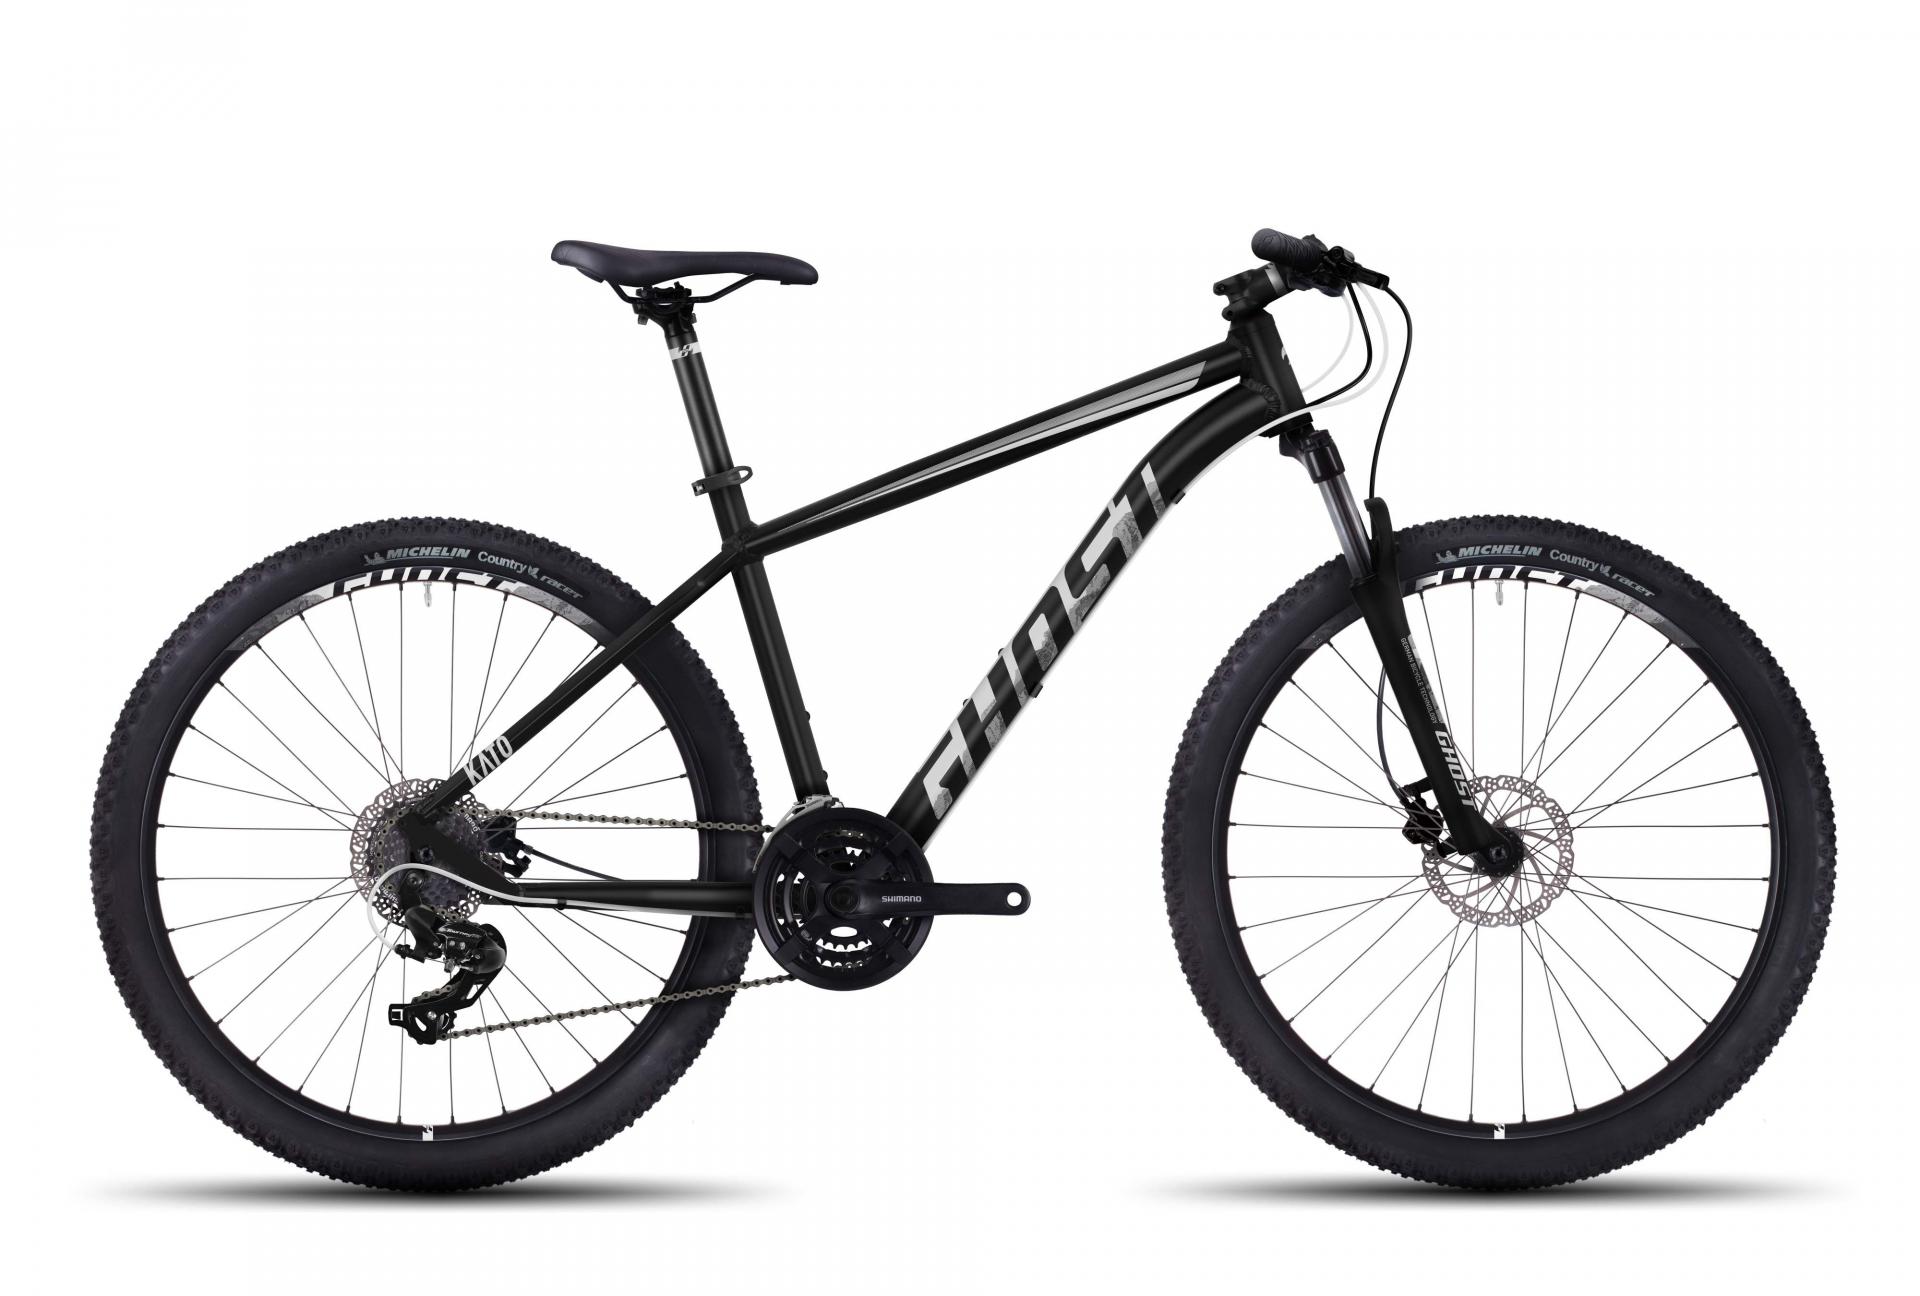 VTT semi-rigide Ghost Kato 1 27.5 noir/blanc - XXS